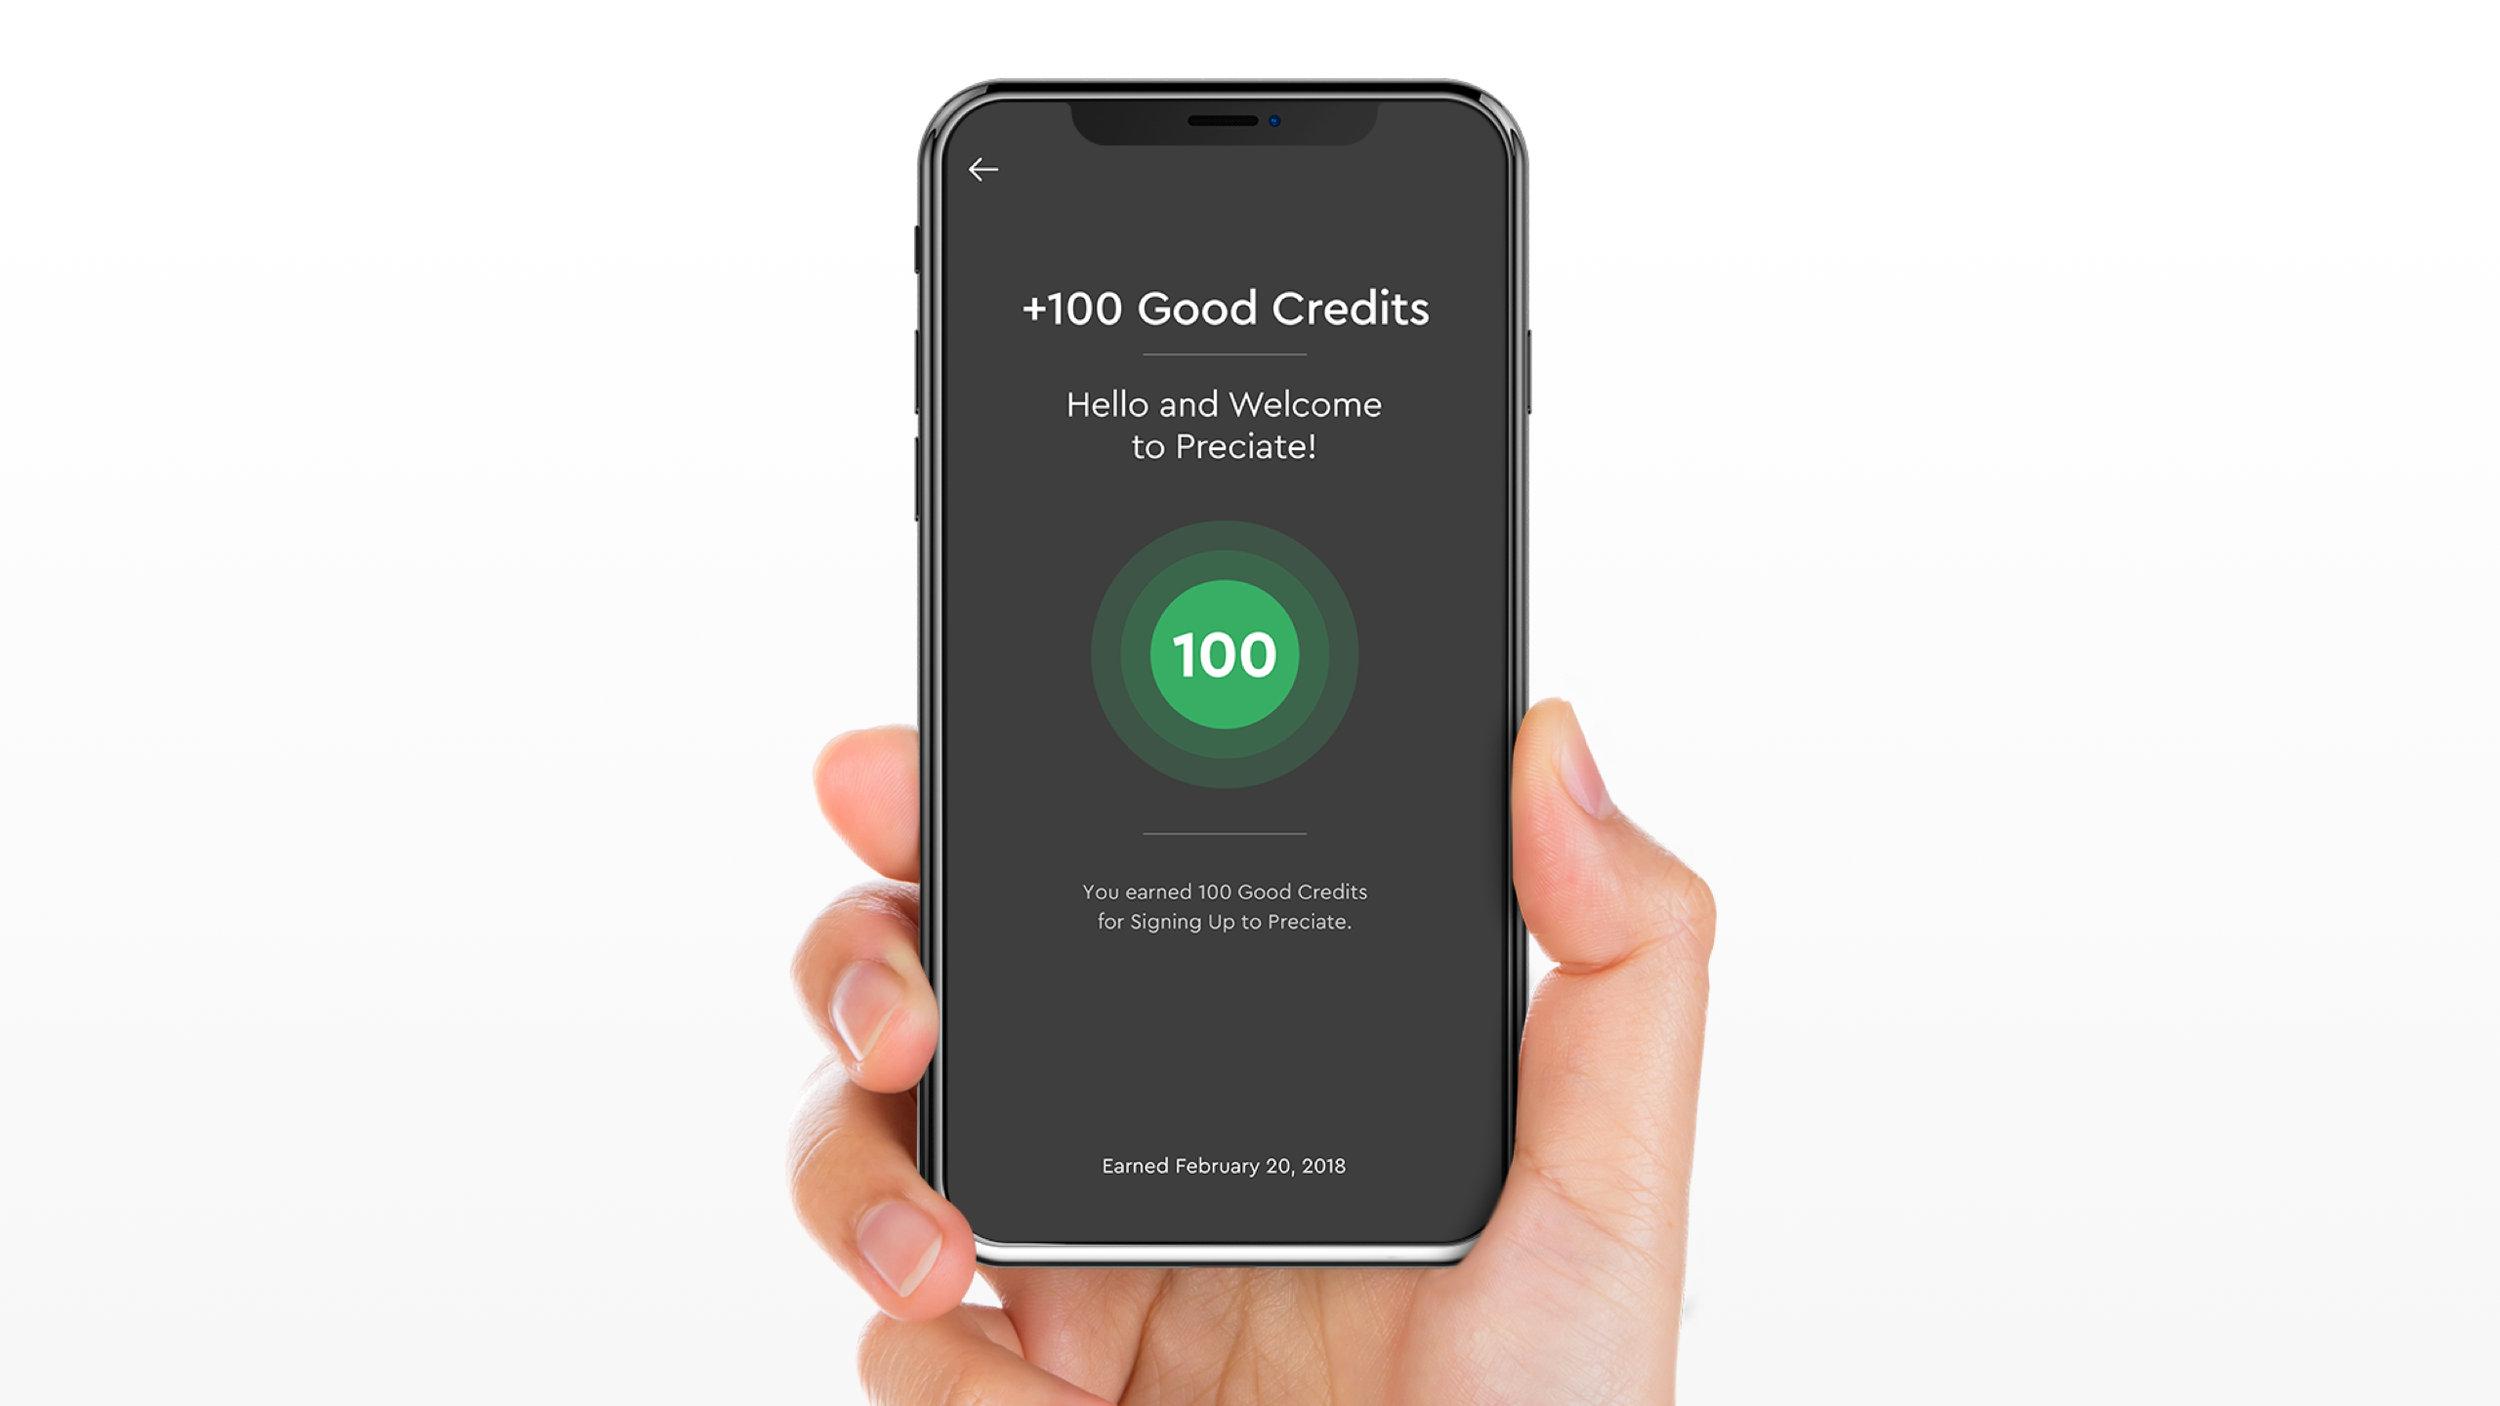 Good Credits Gained in the Preciate App